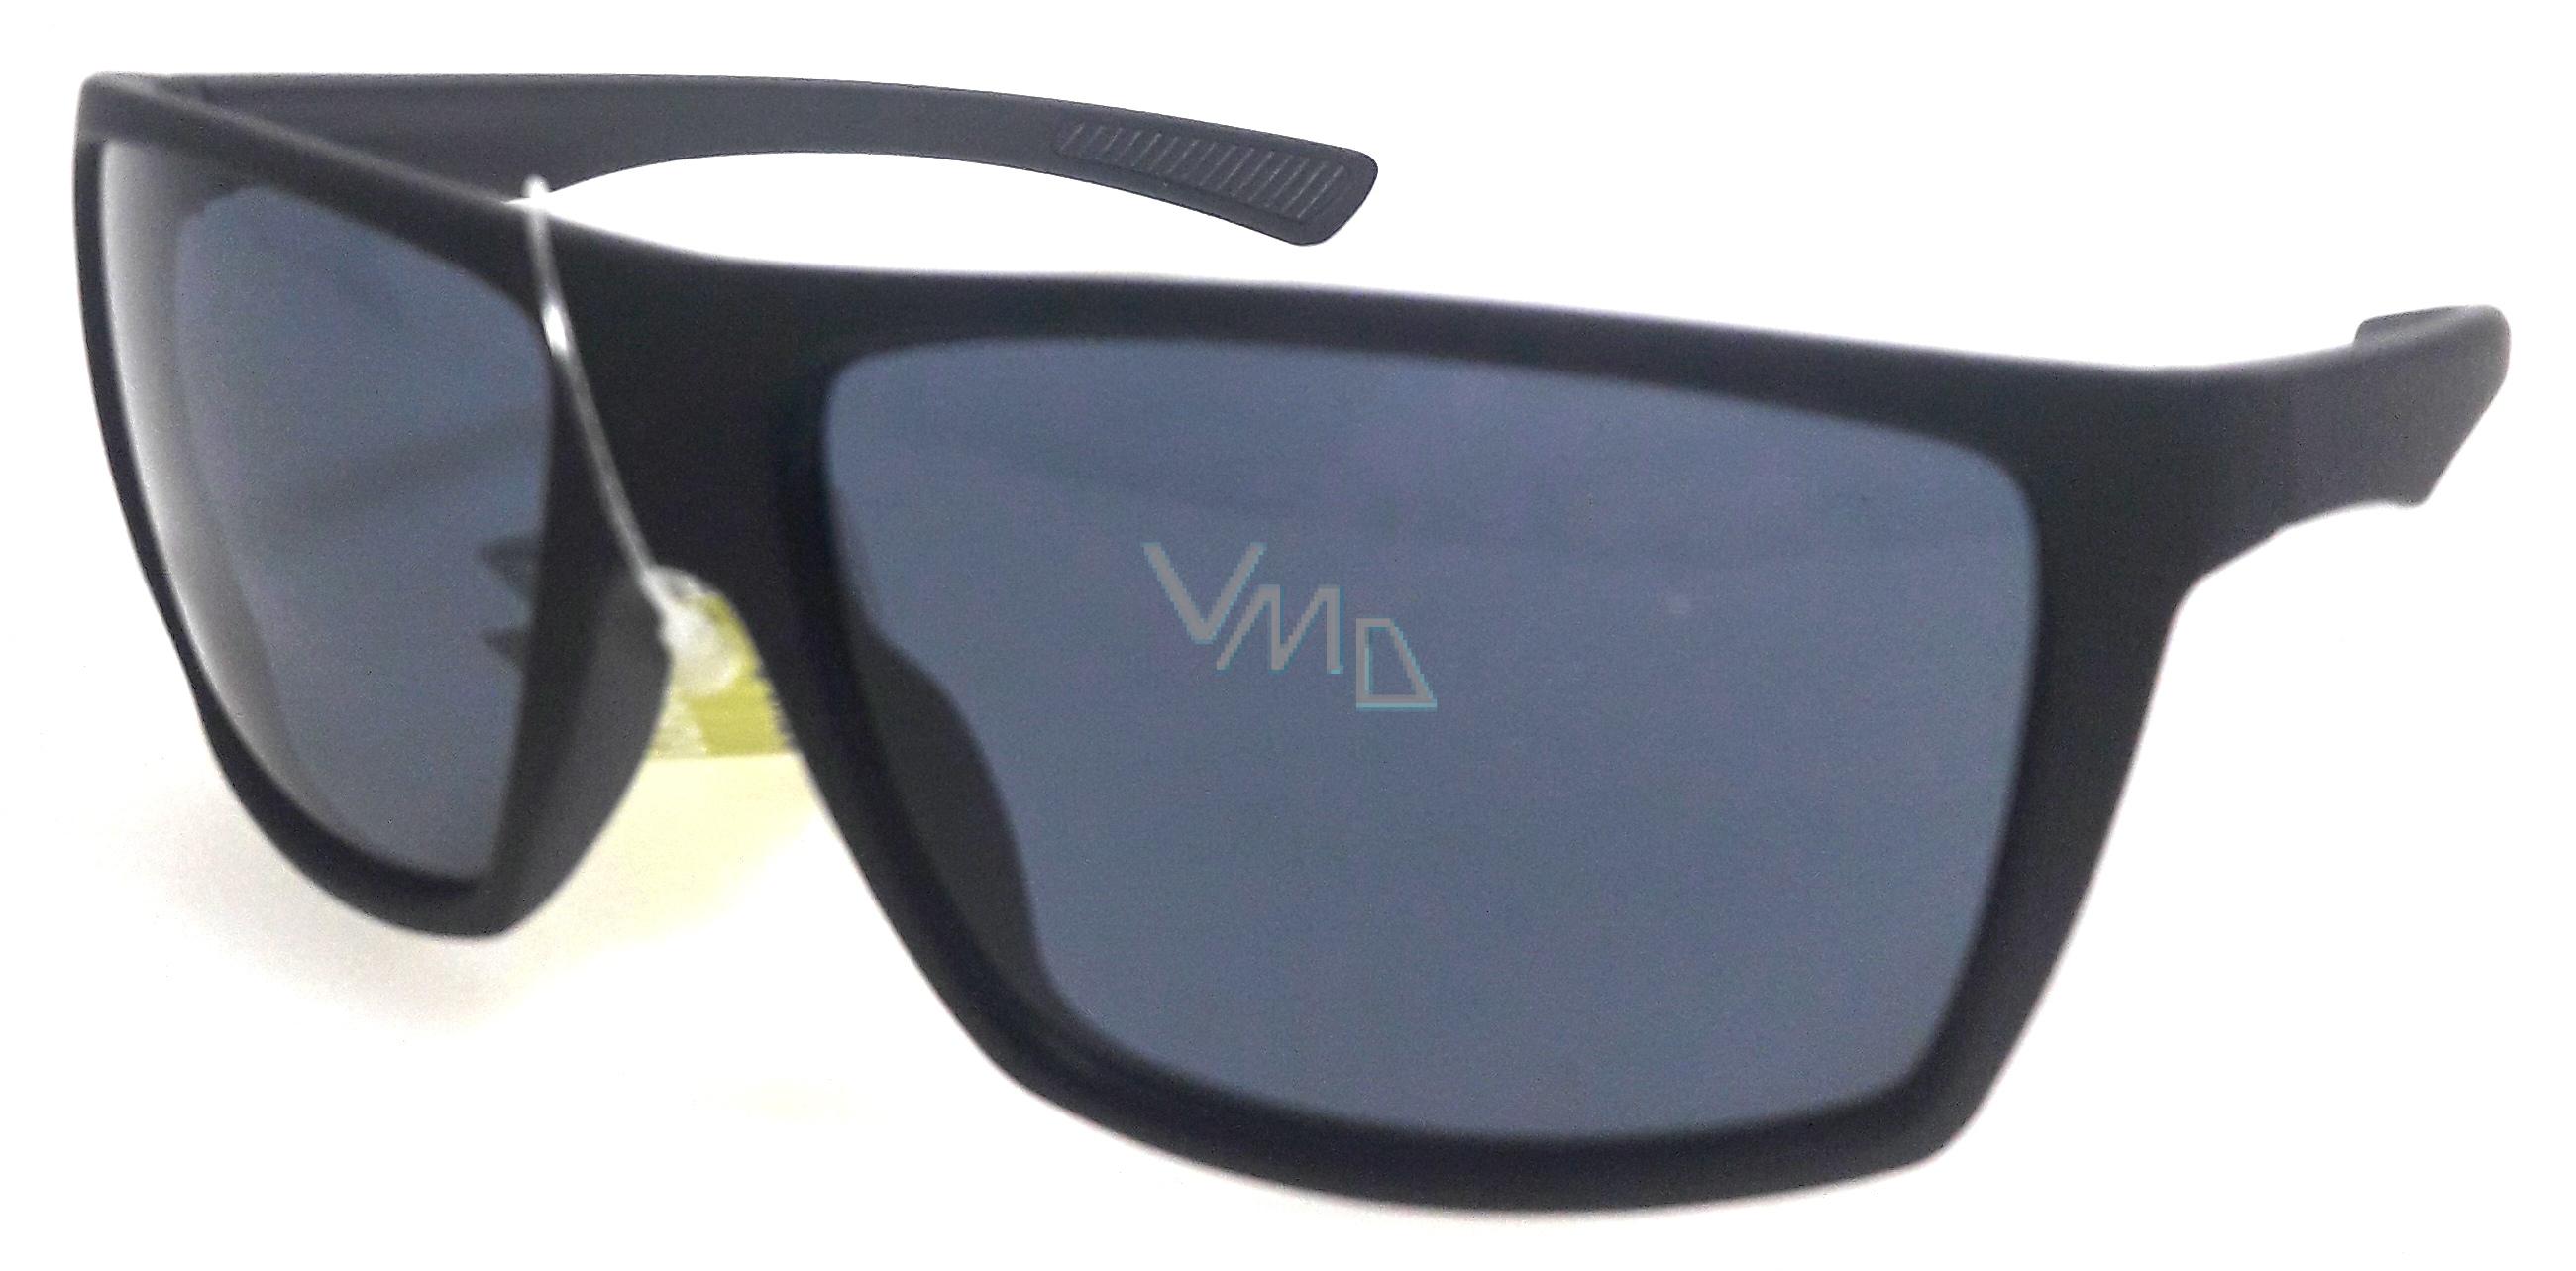 d61d366d2 Slnečné okuliare AZ Sport 9140 - VMD drogerie